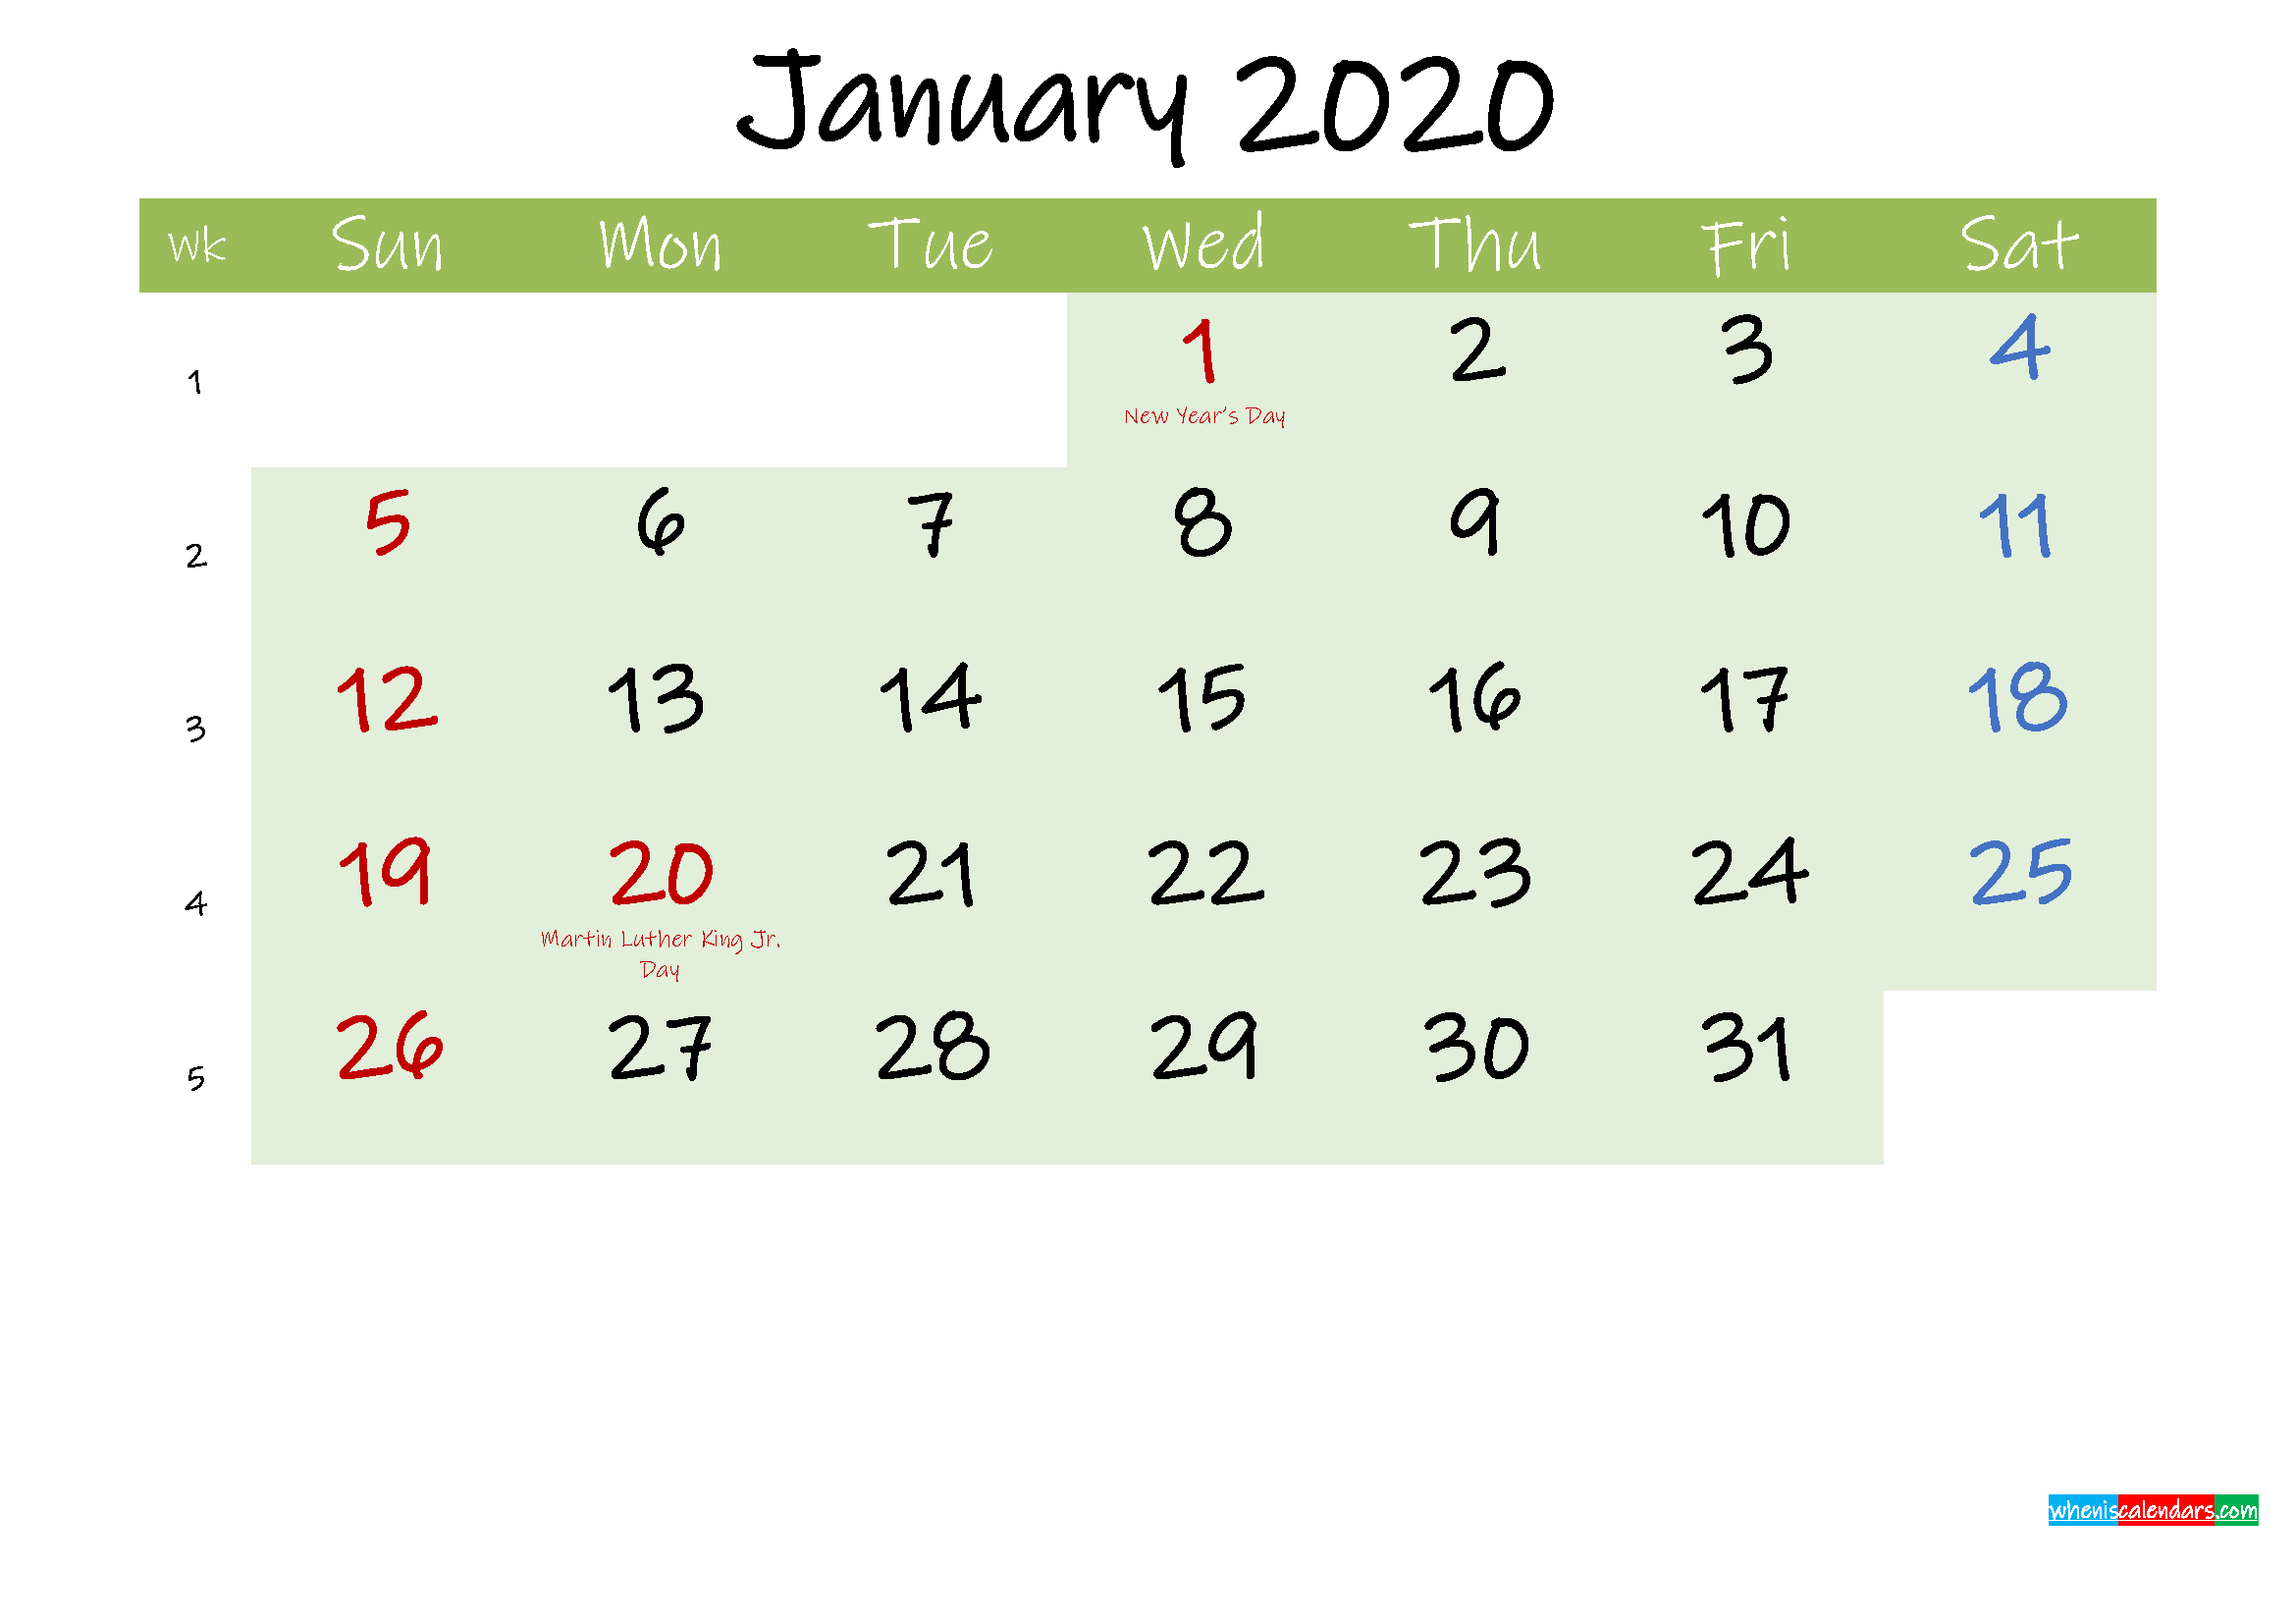 January 2020 Calendar with Holidays Printable